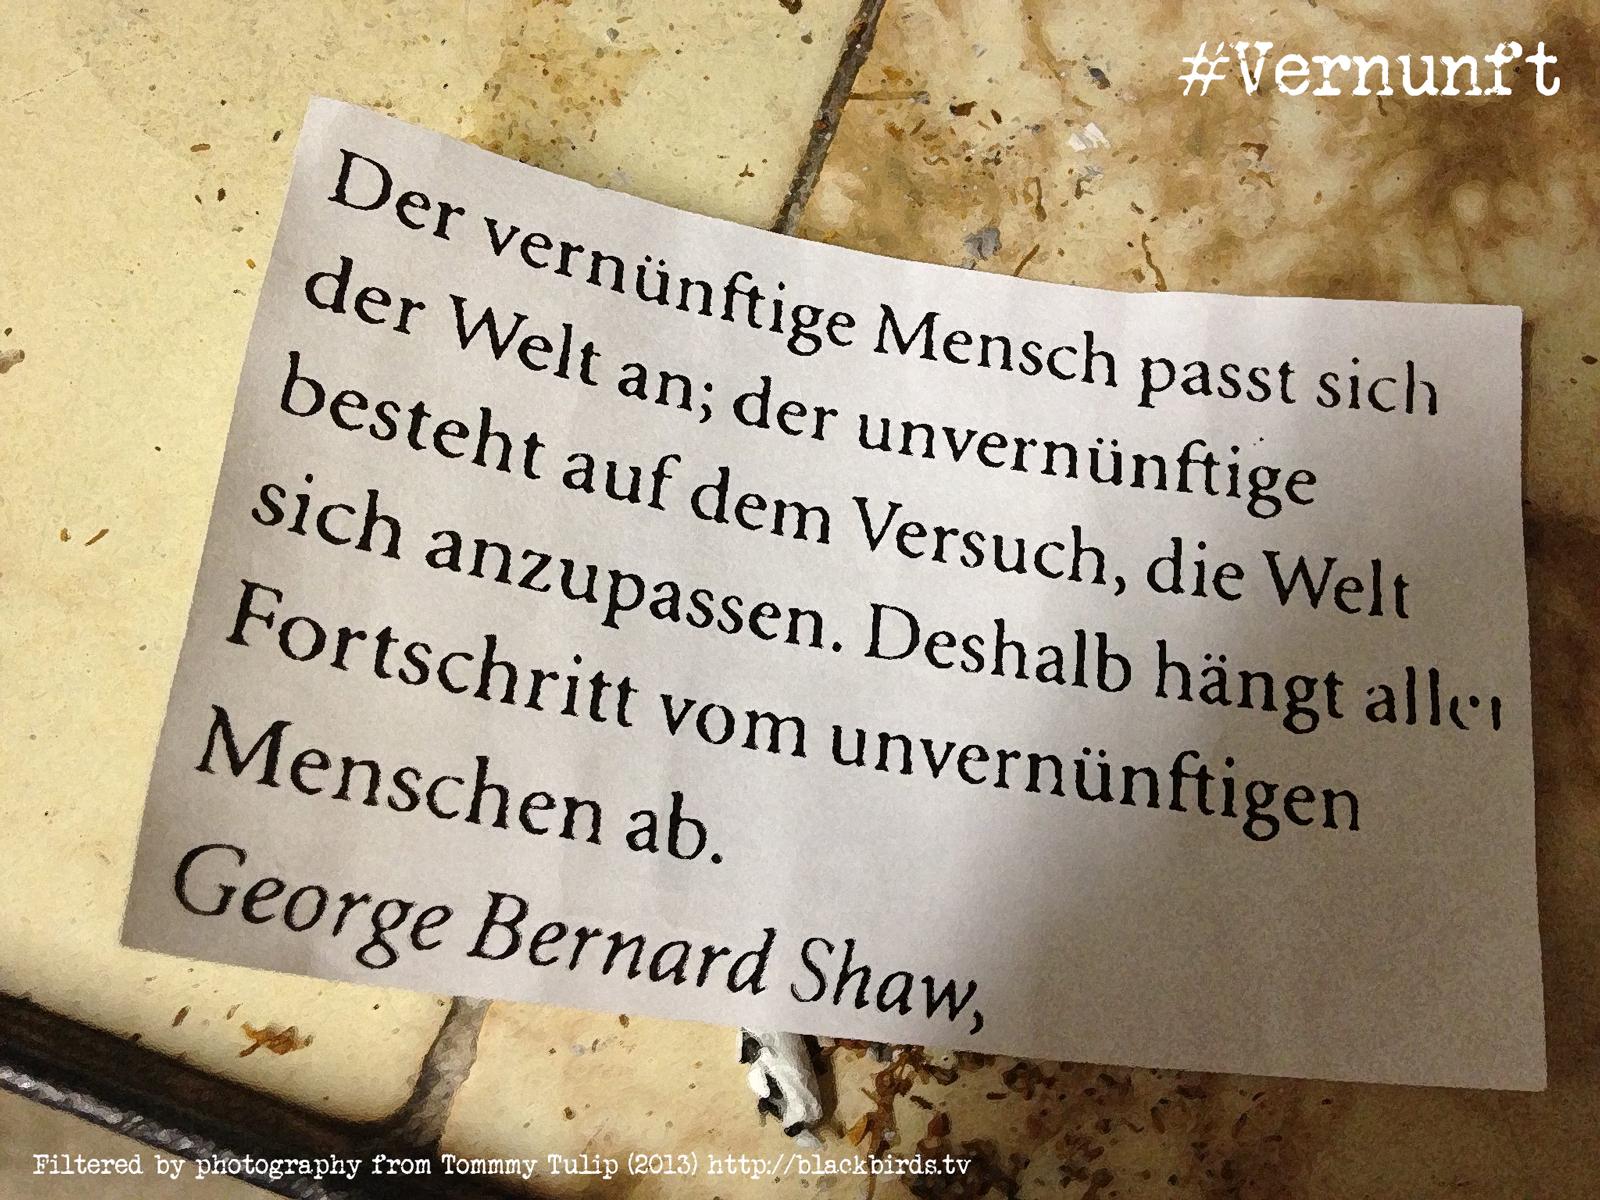 Vernunft_George.Bernhard.Shaw